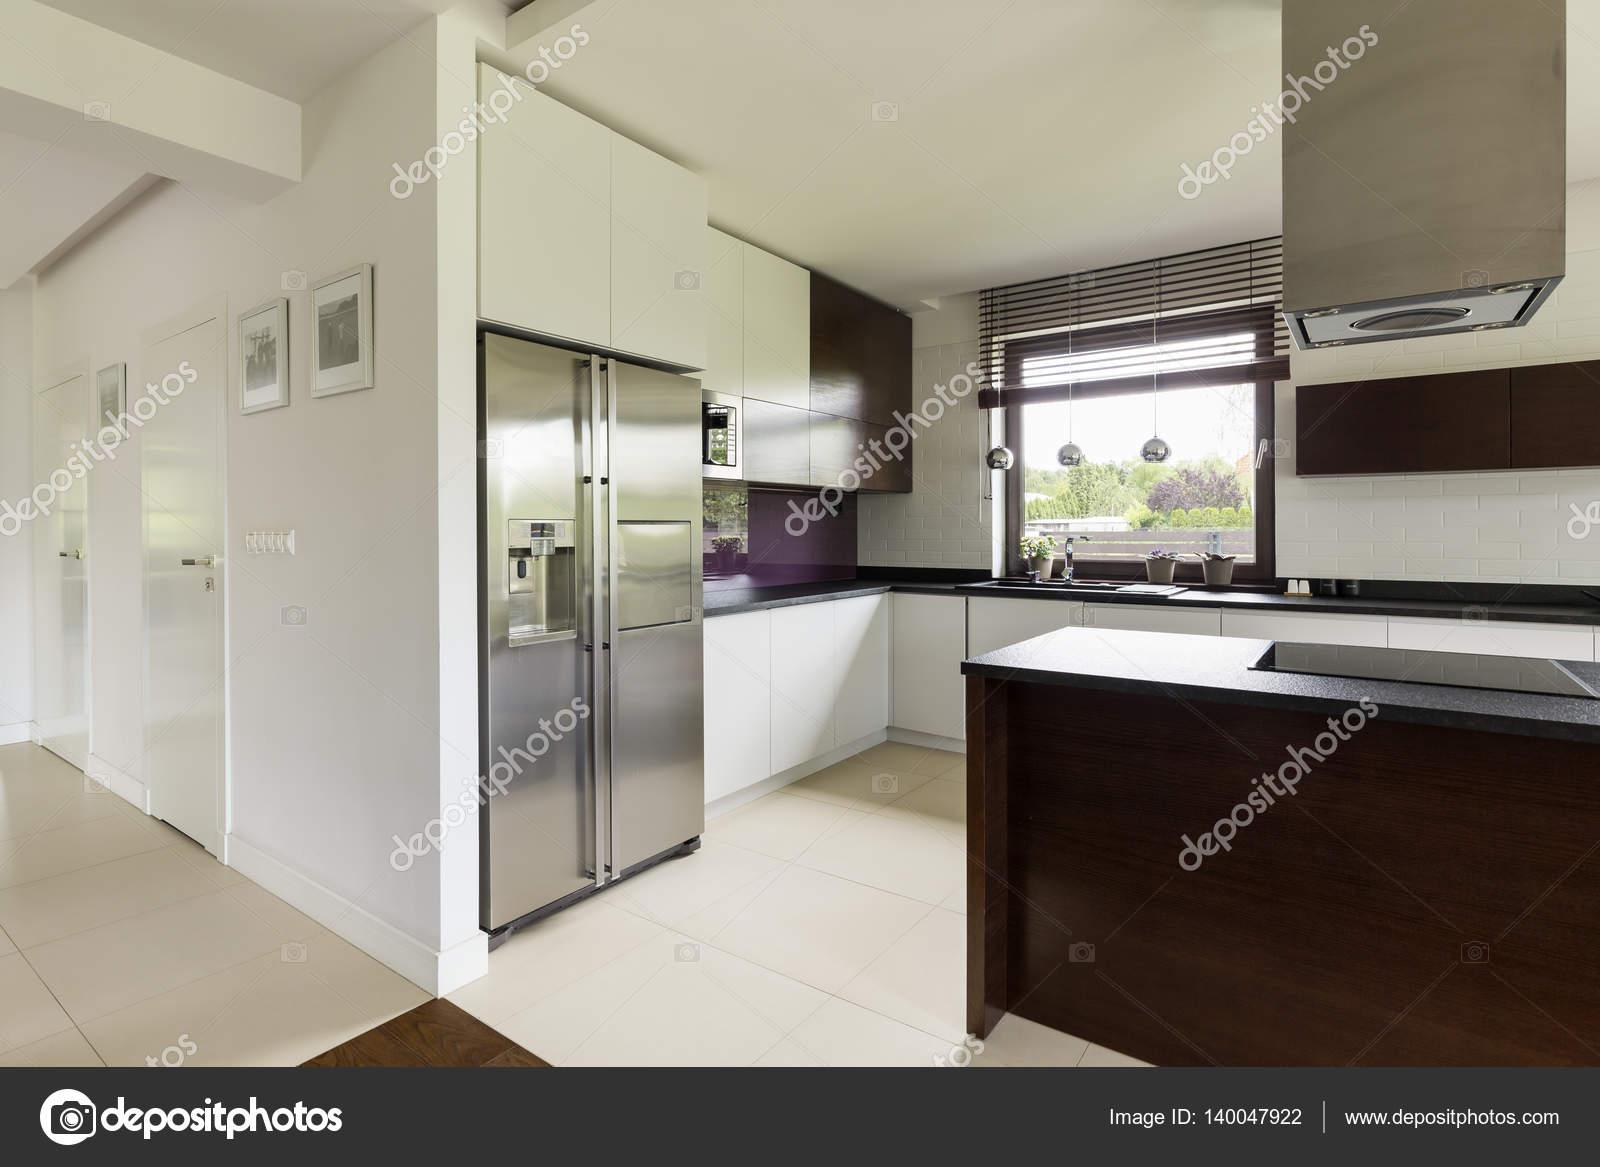 Ruime keuken in modern huis u2014 stockfoto © photographee.eu #140047922